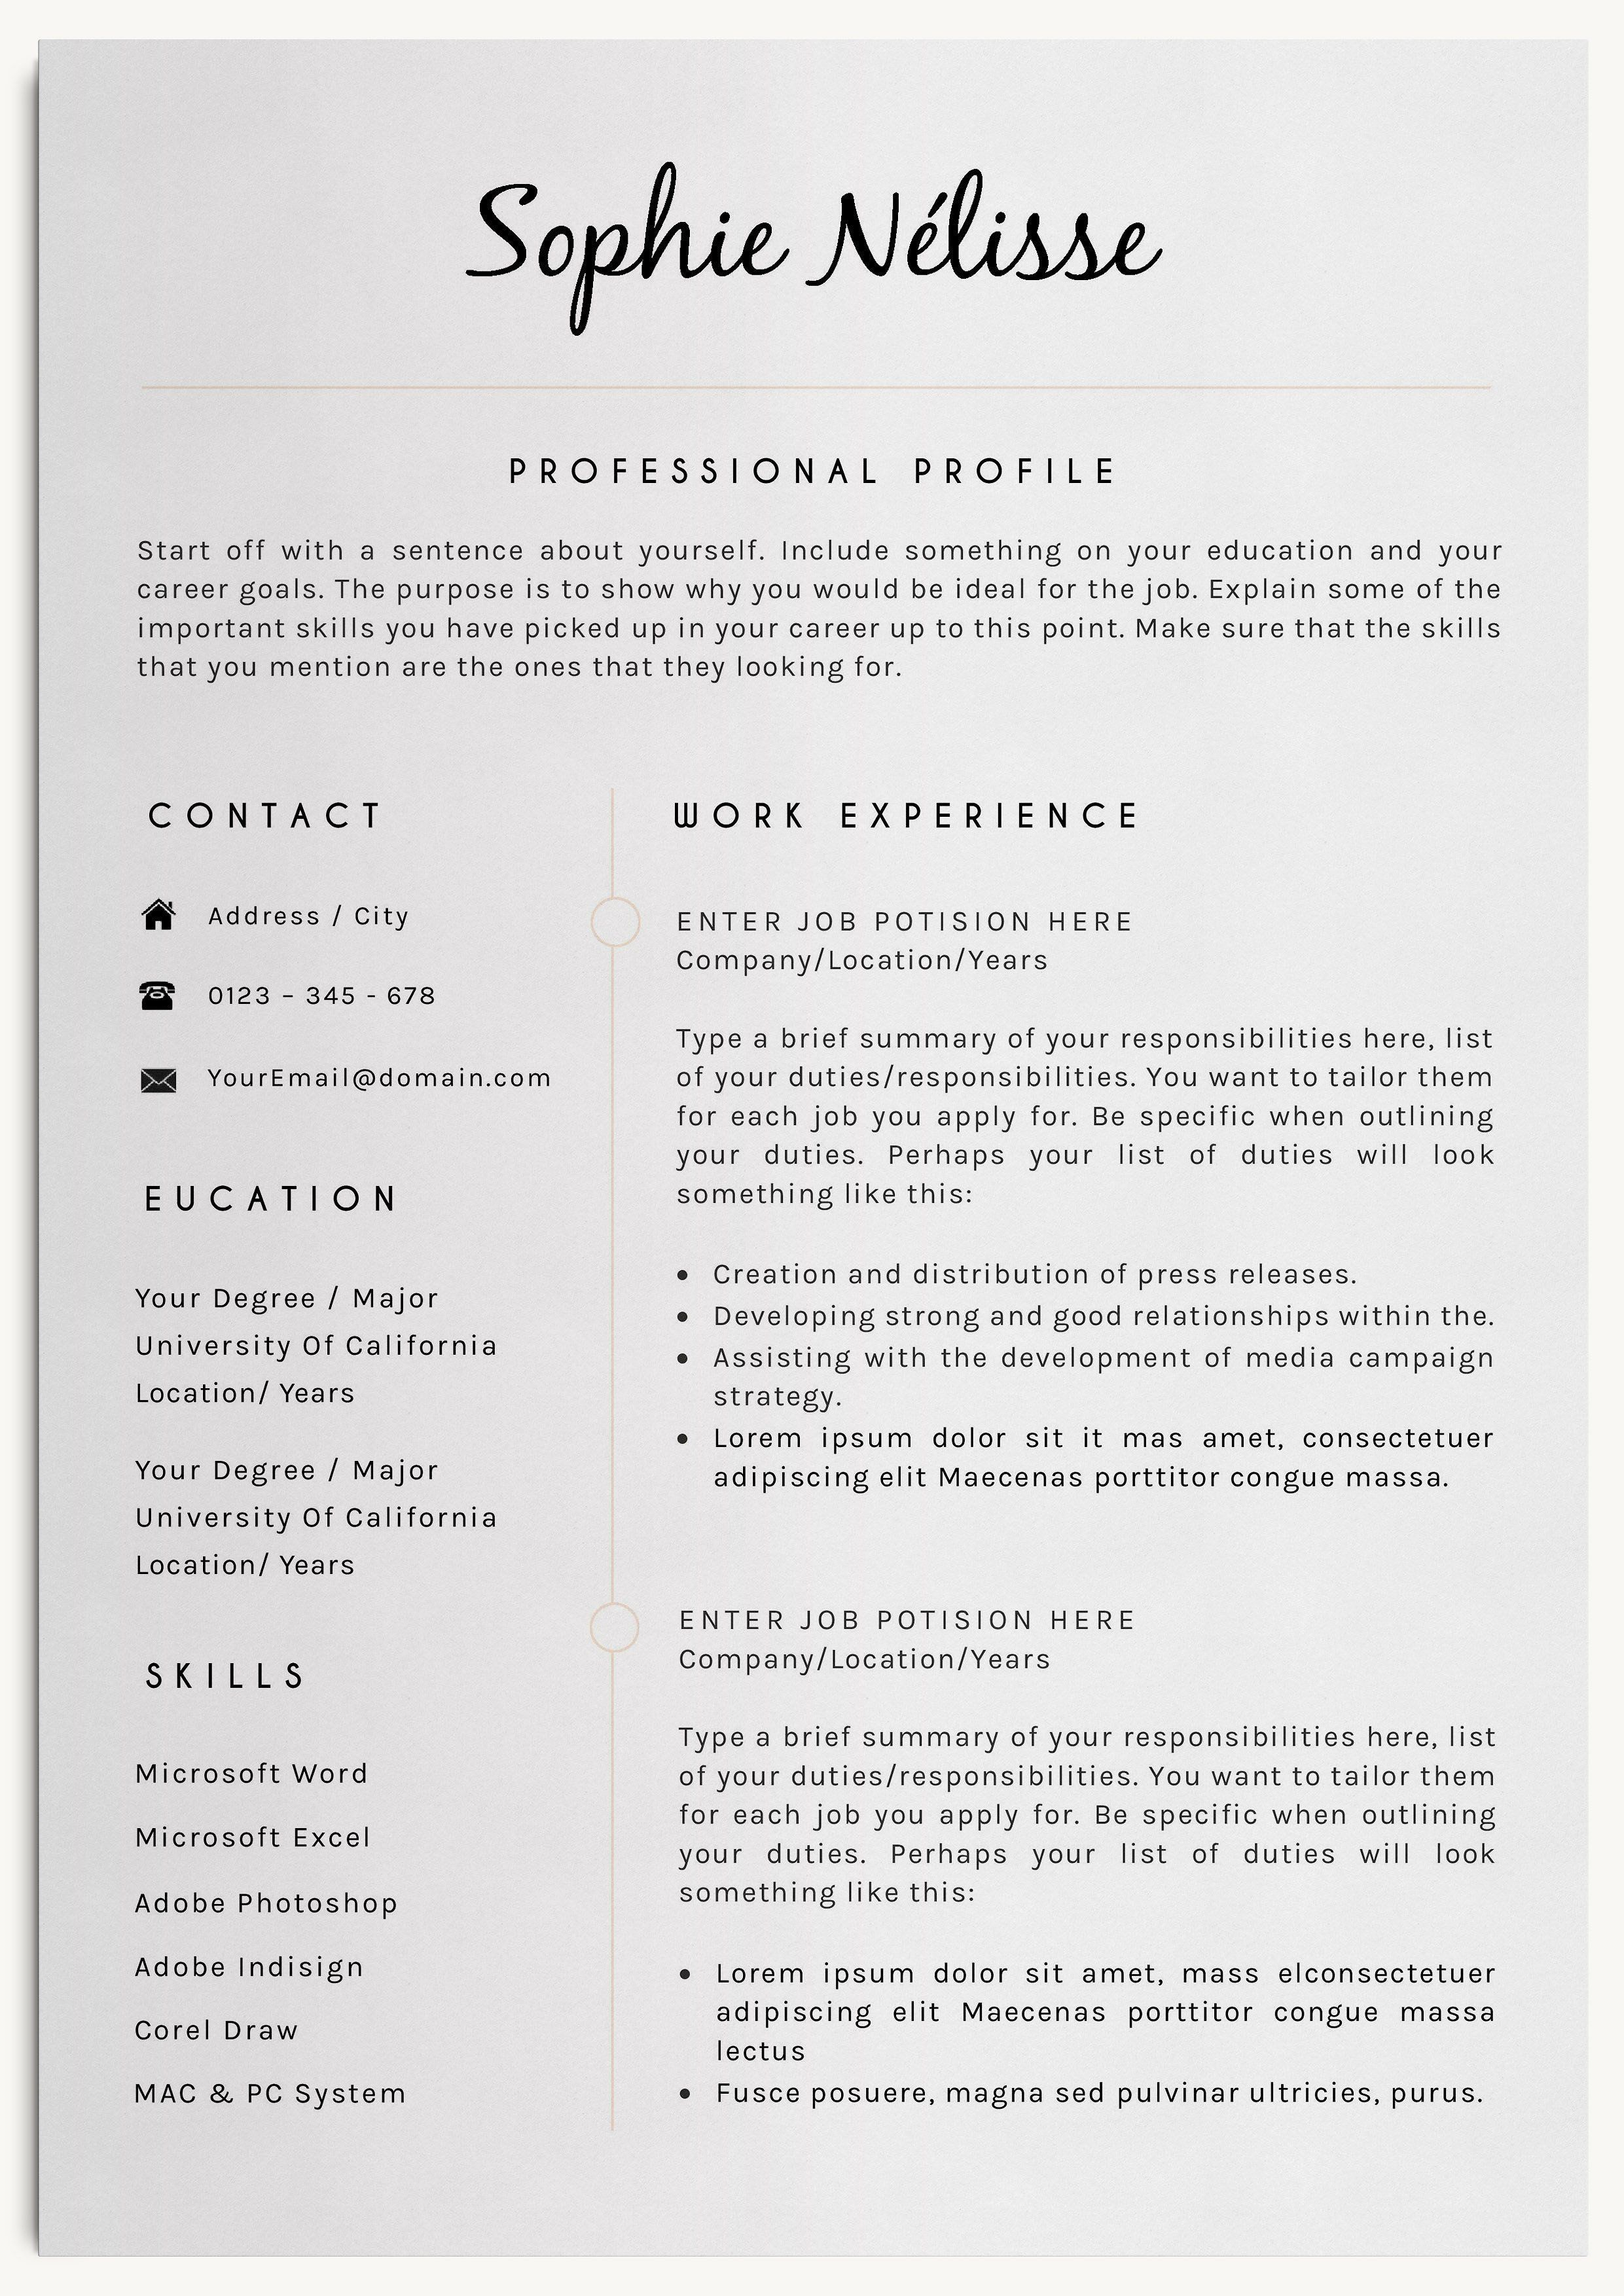 Best Resume Writing Services In Atlanta Ga 5k